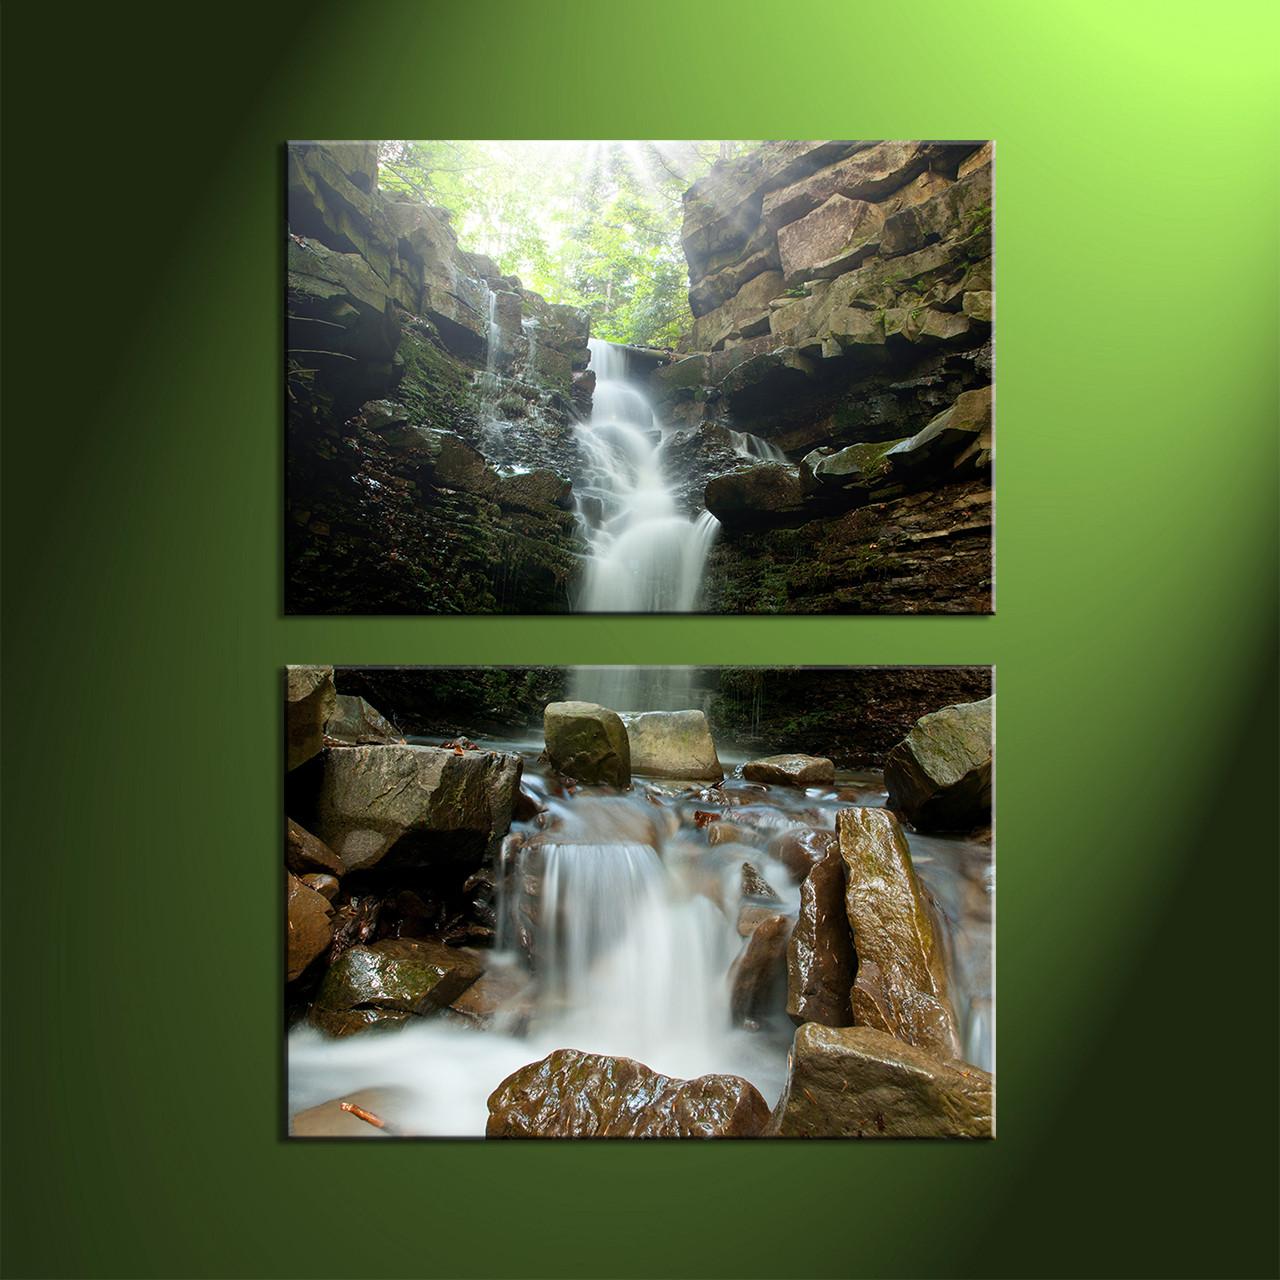 Waterfall Home Decor 2 Piece Waterfall Green Scenery Large Canvas